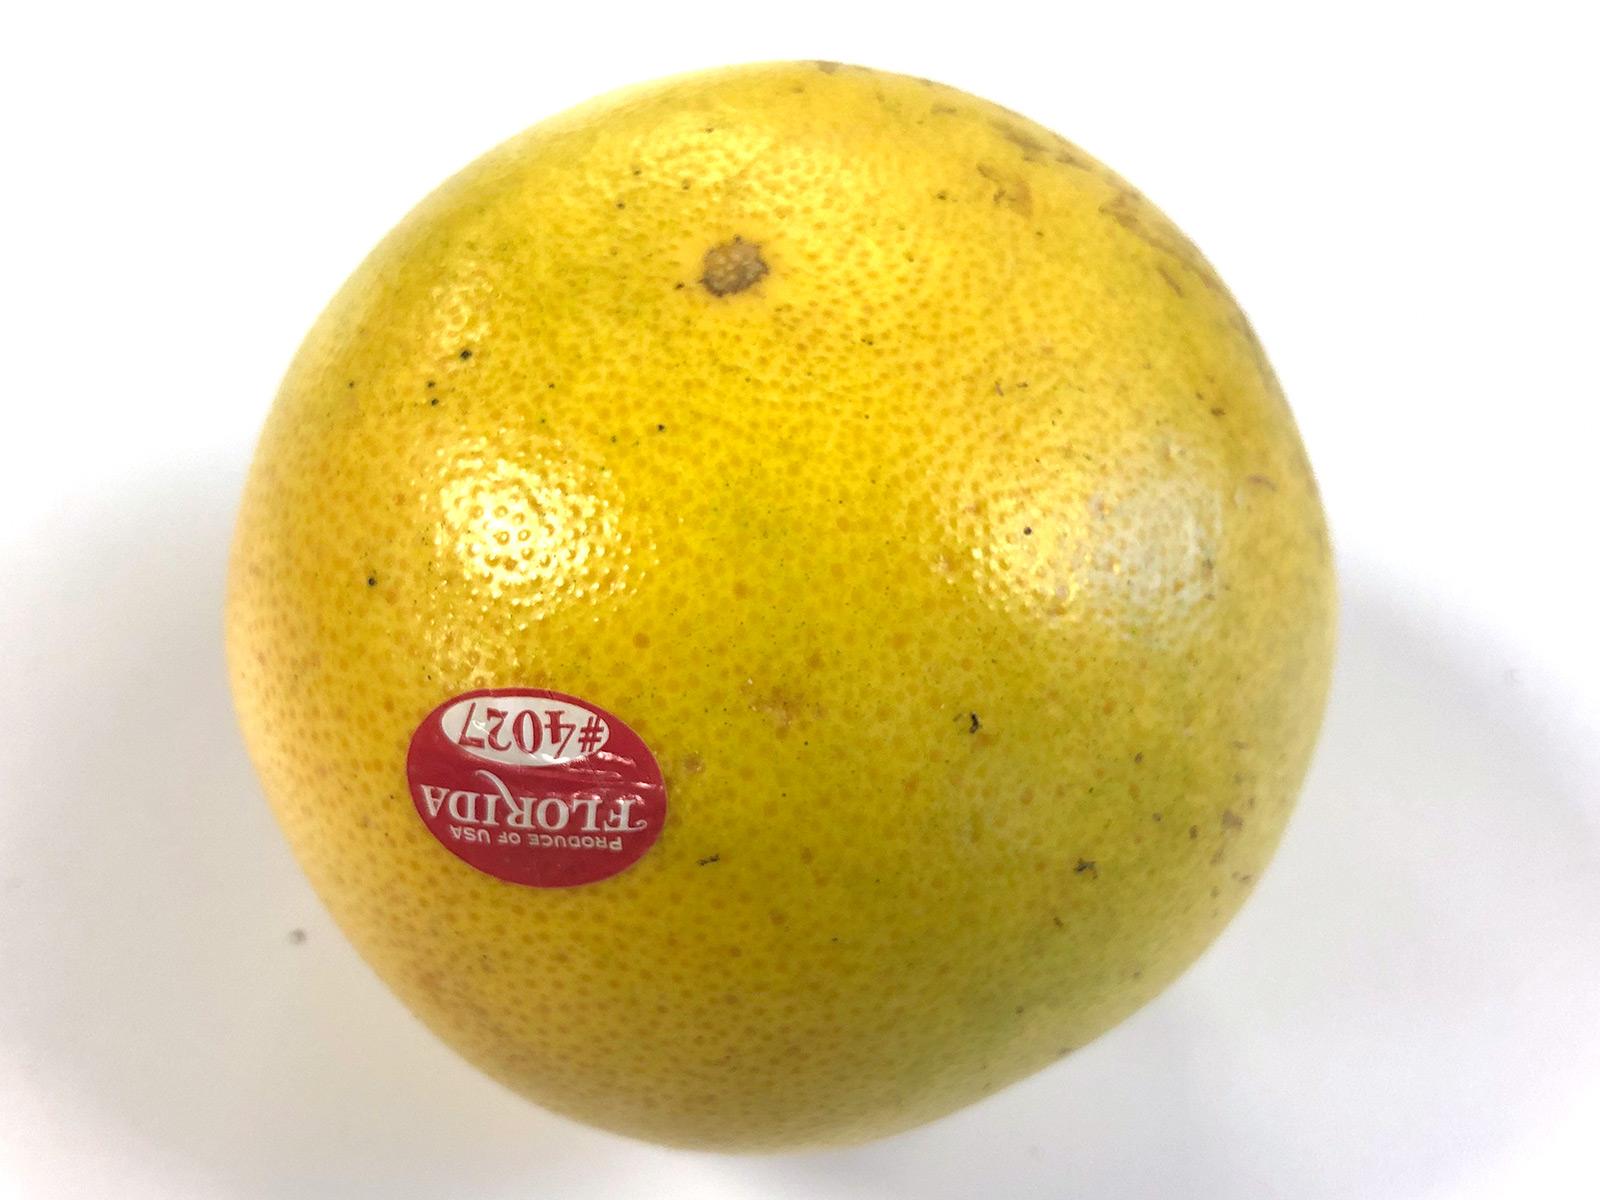 4027-florida-pink-grapefruit.jpg